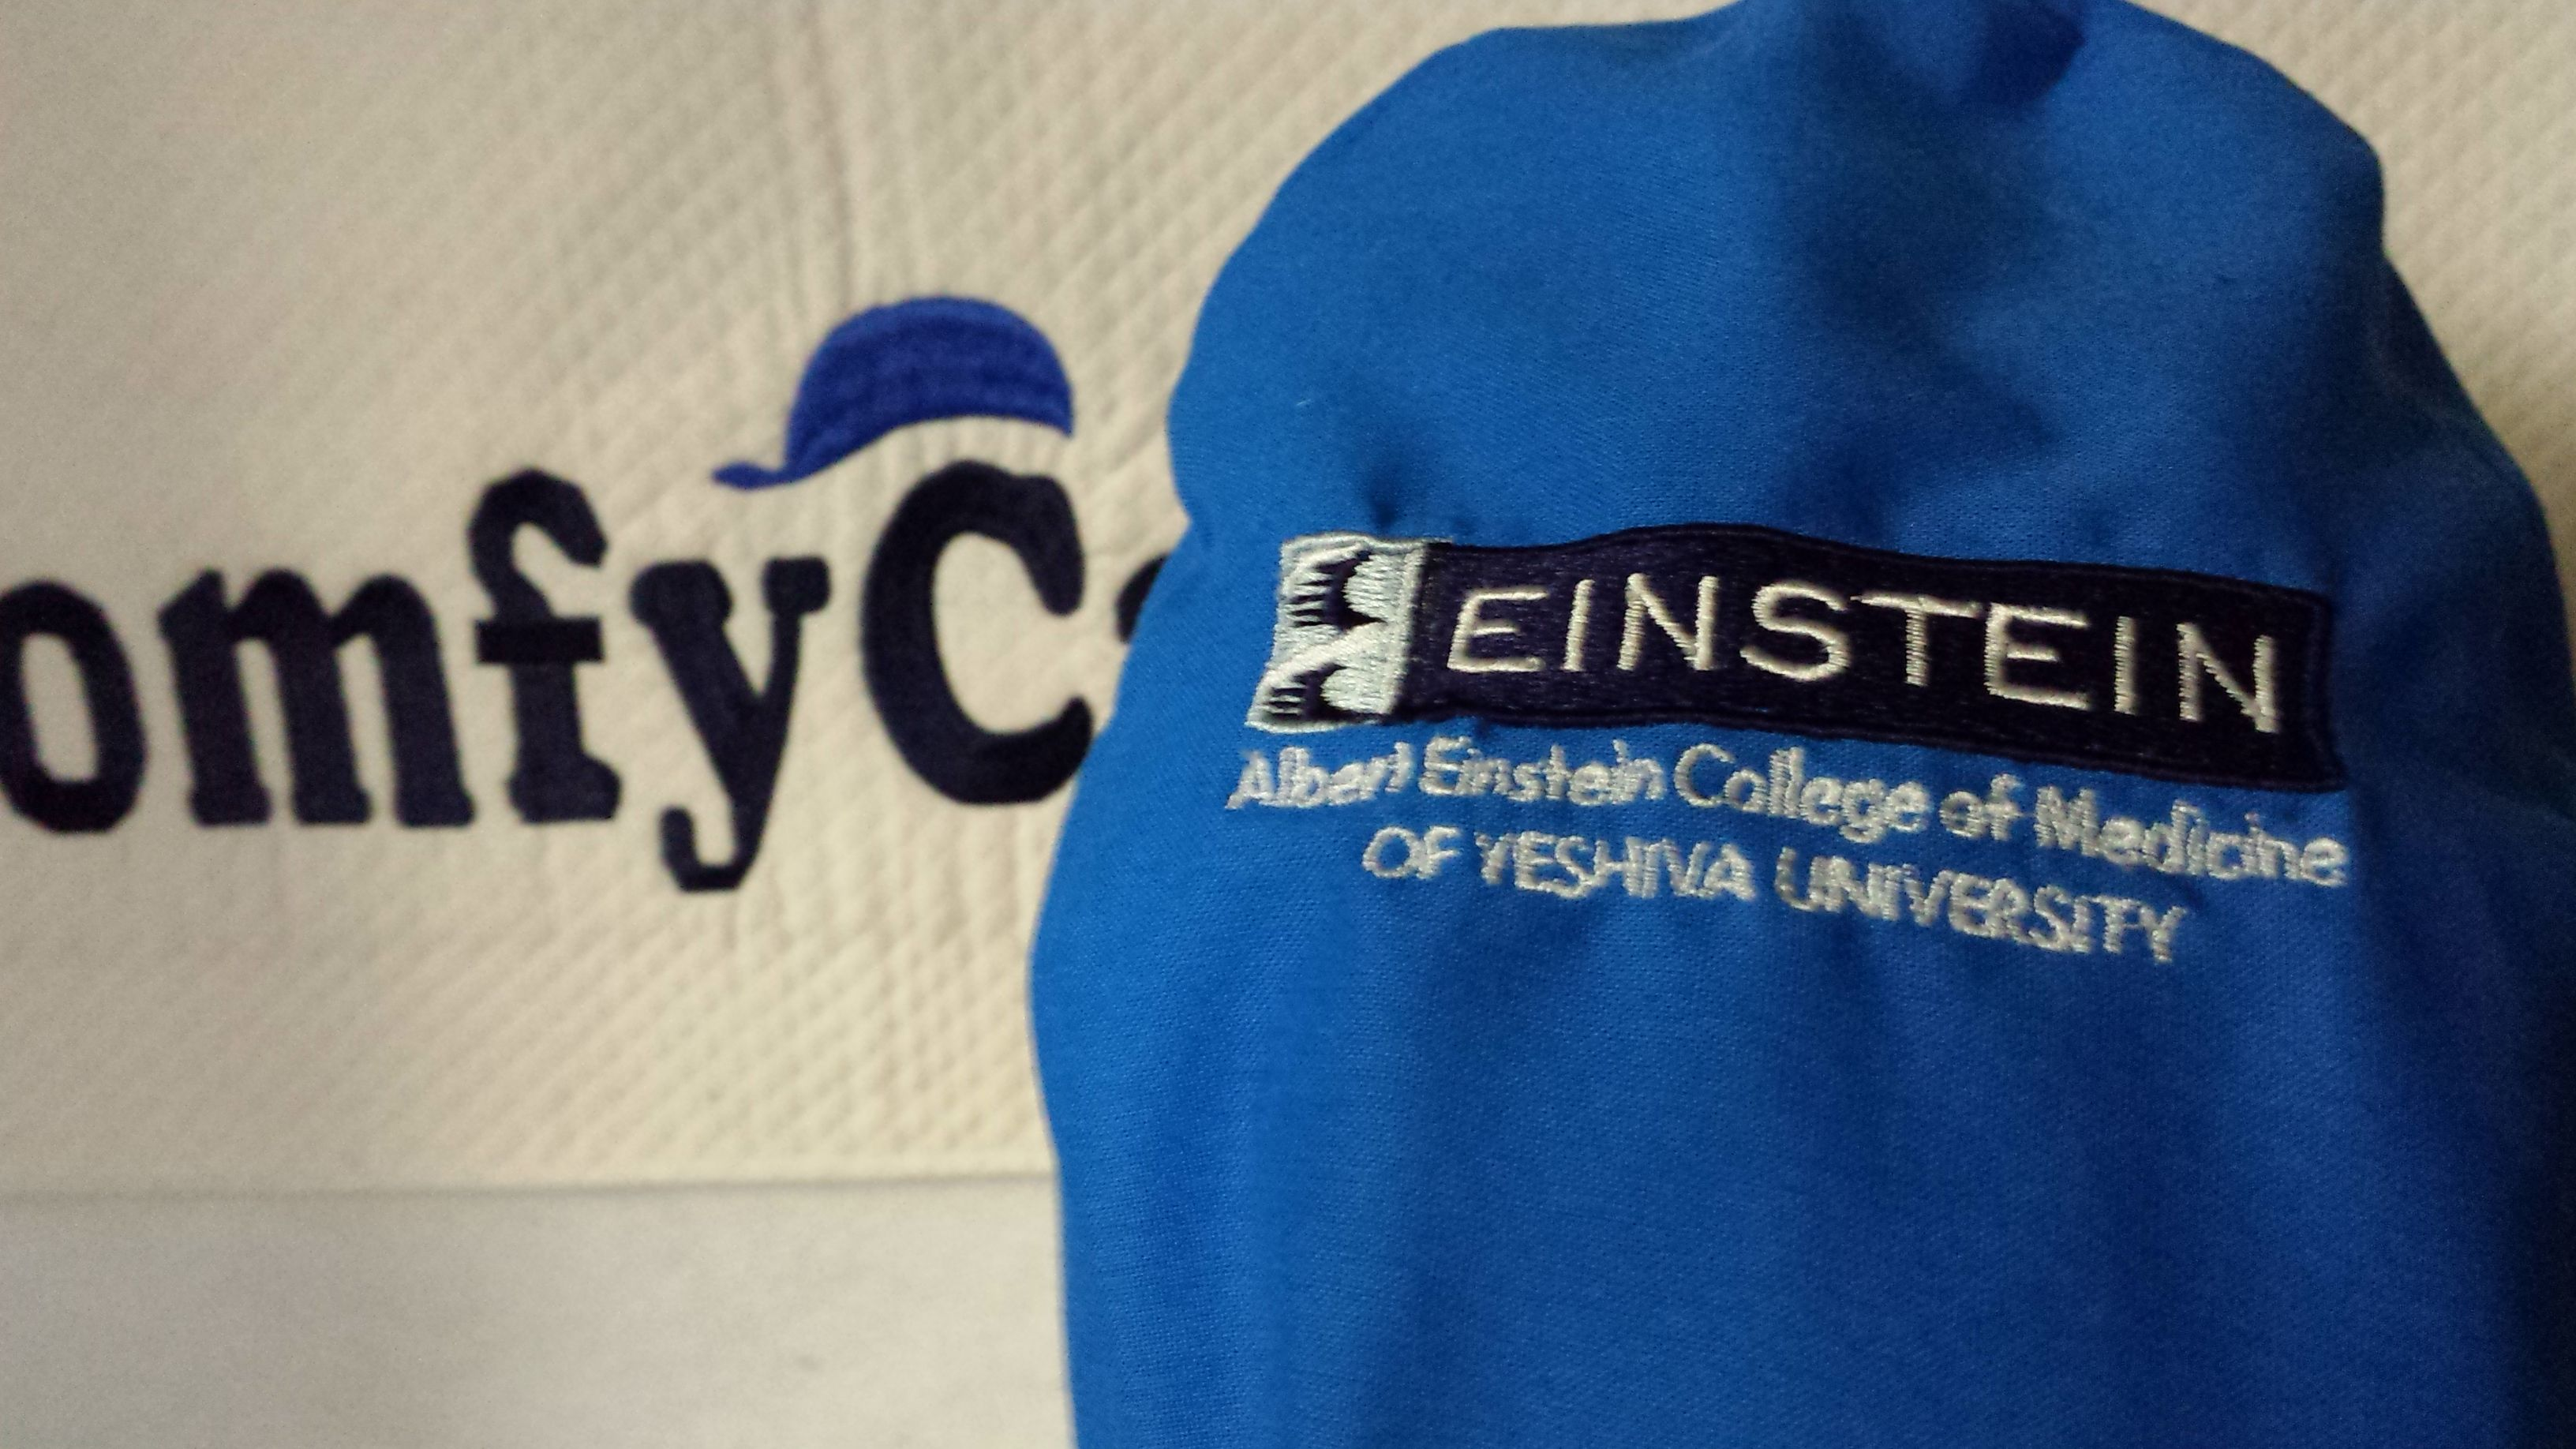 Albert Einstein College of Medicine logo embroidered on the top part of a  male scrub cap